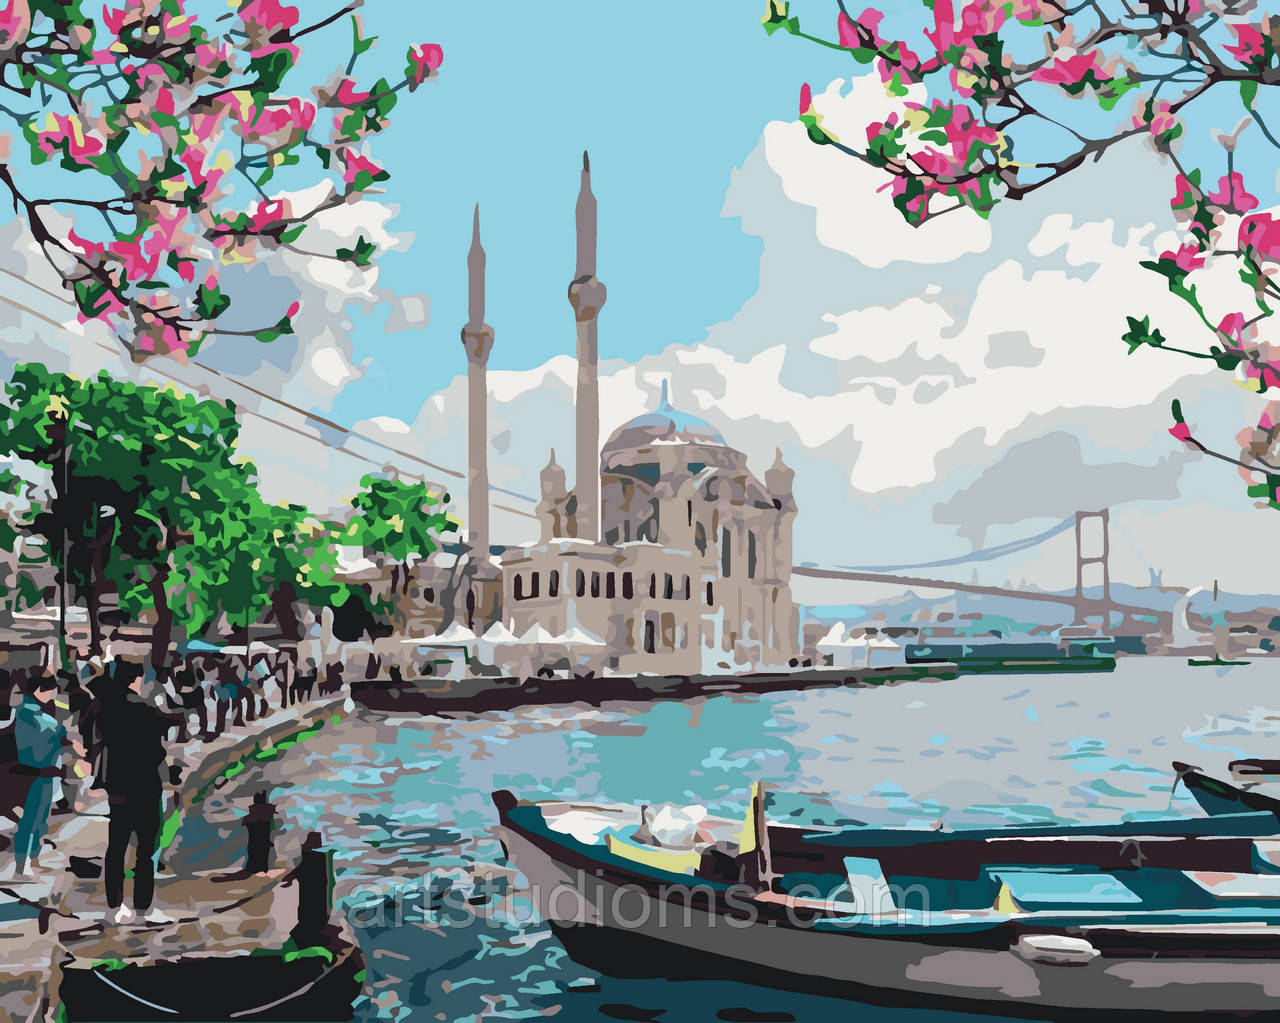 Картина раскраска антистресс Турецкое побережье, 40 х 50 см С Коробкой